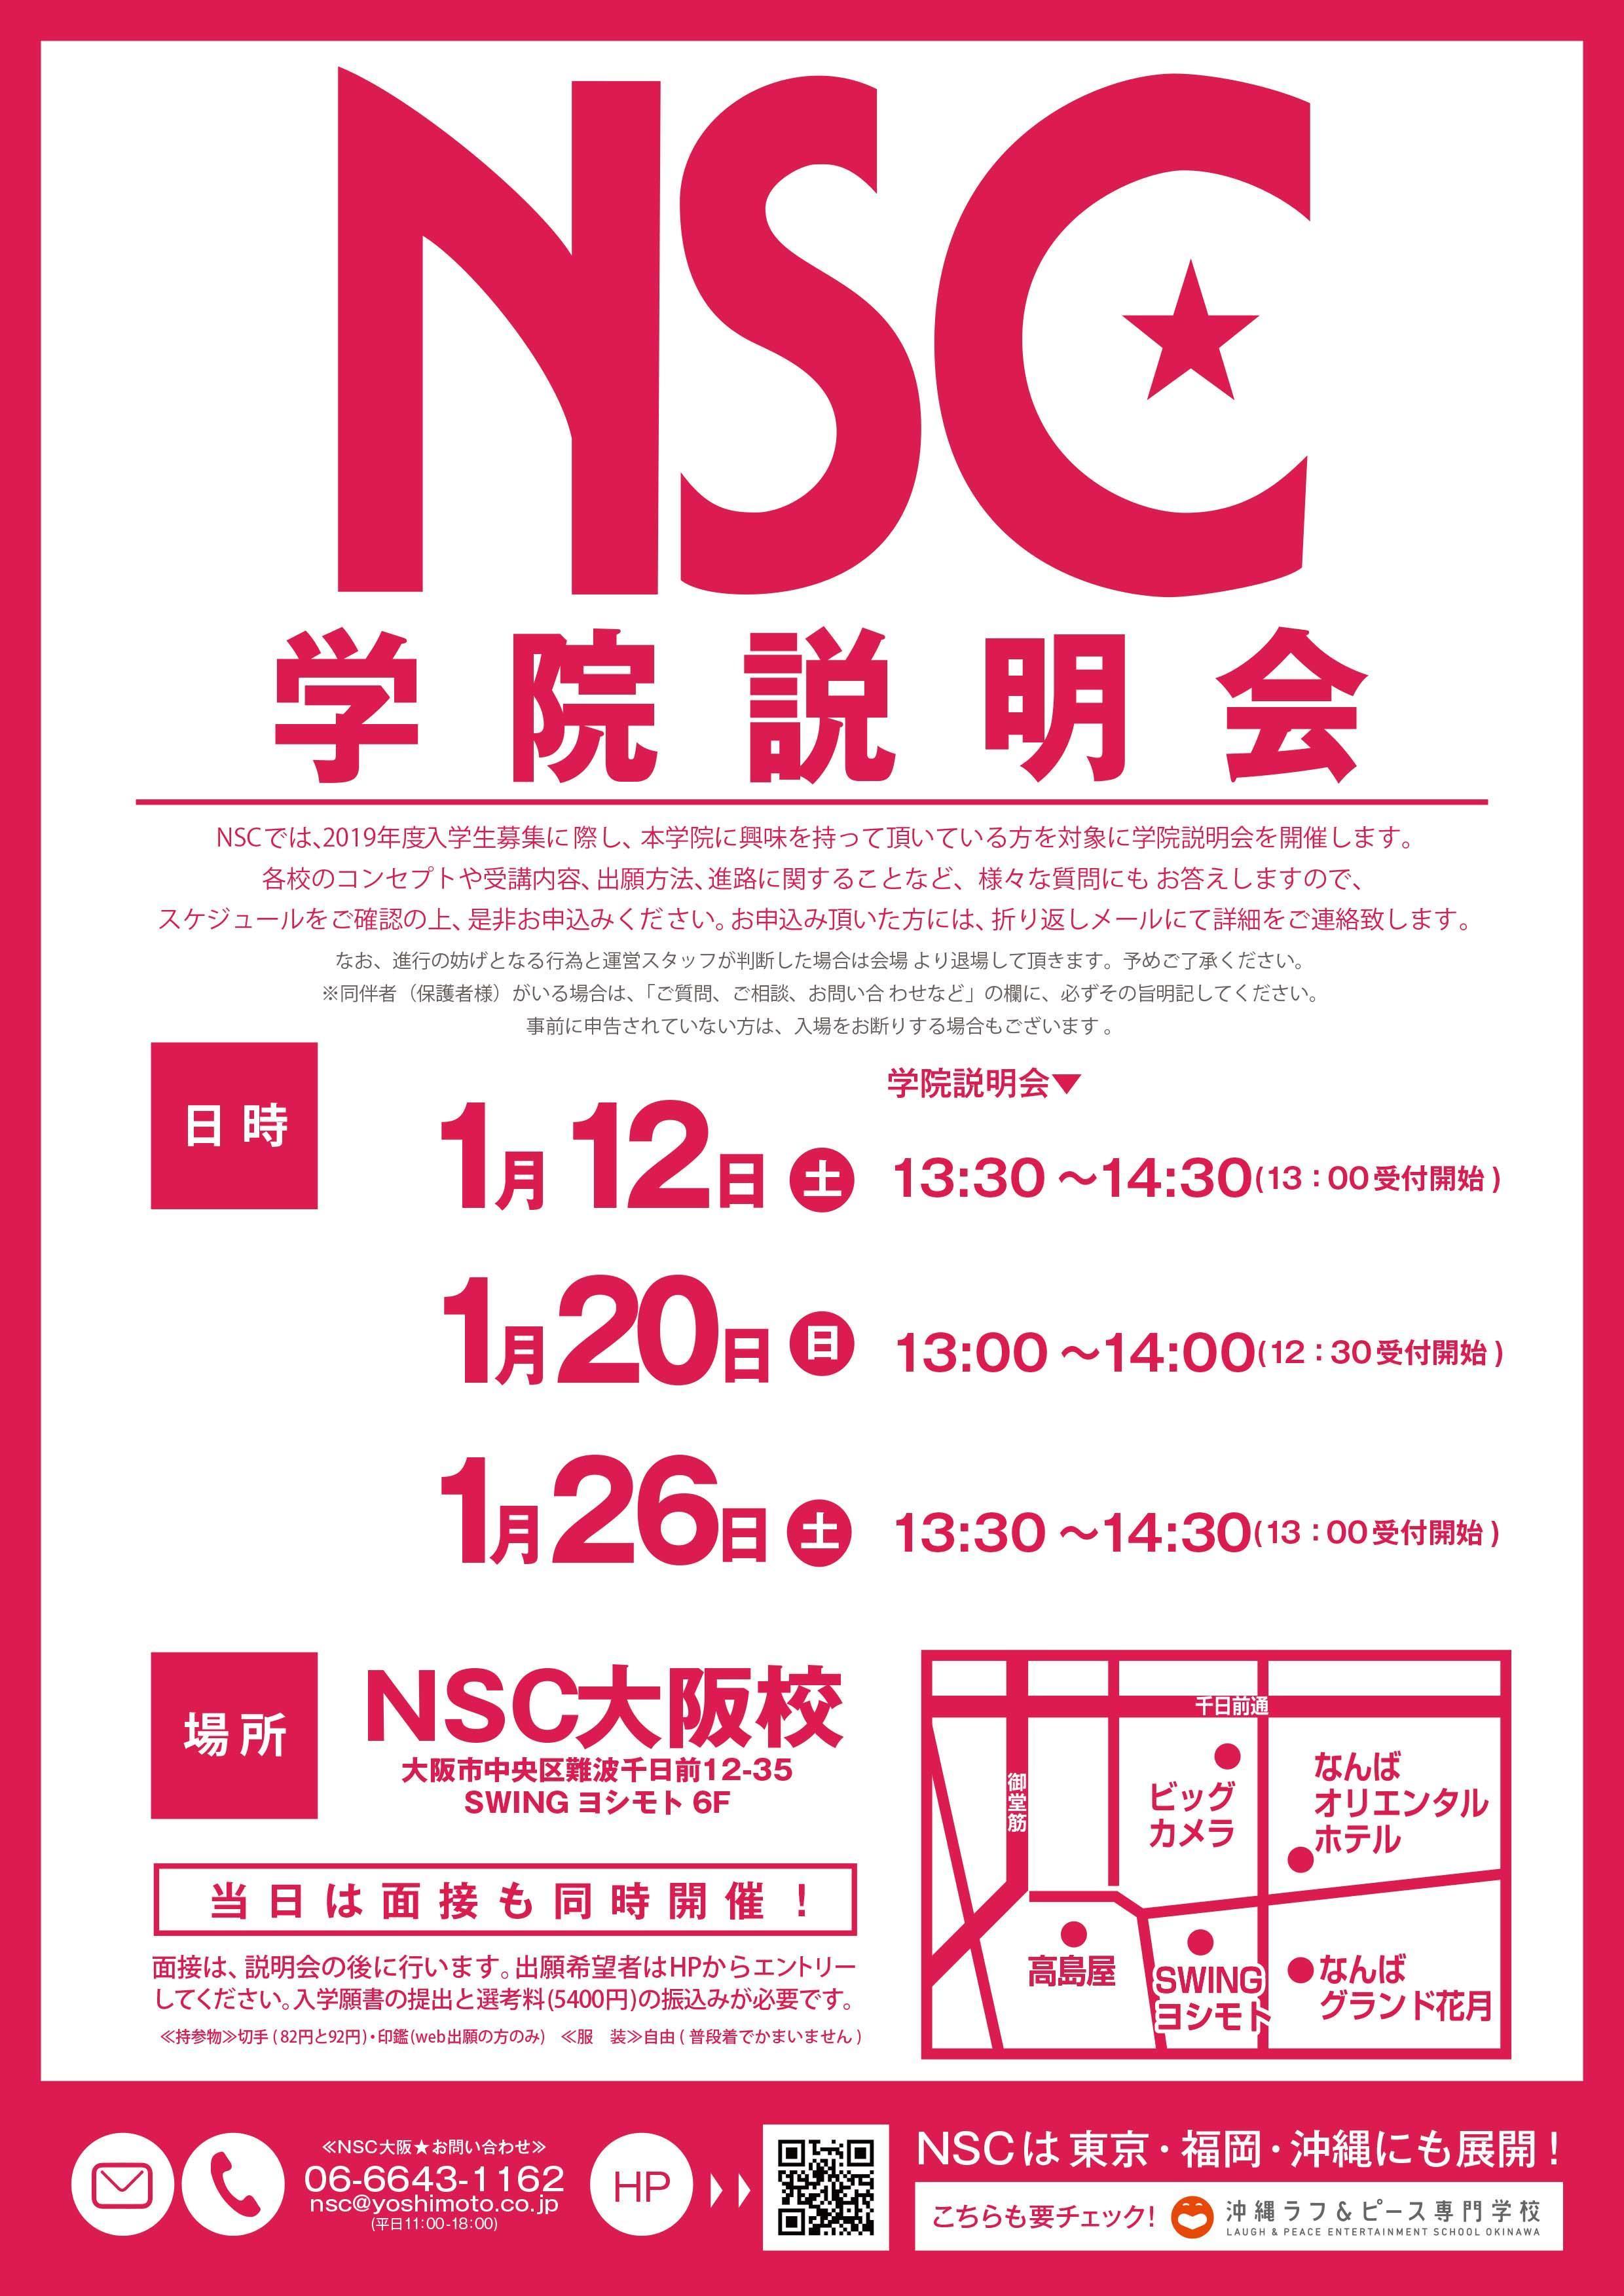 http://news.yoshimoto.co.jp/20181223000901-467cc7f660e541d3a993eb7b06b13515012768d9.jpg